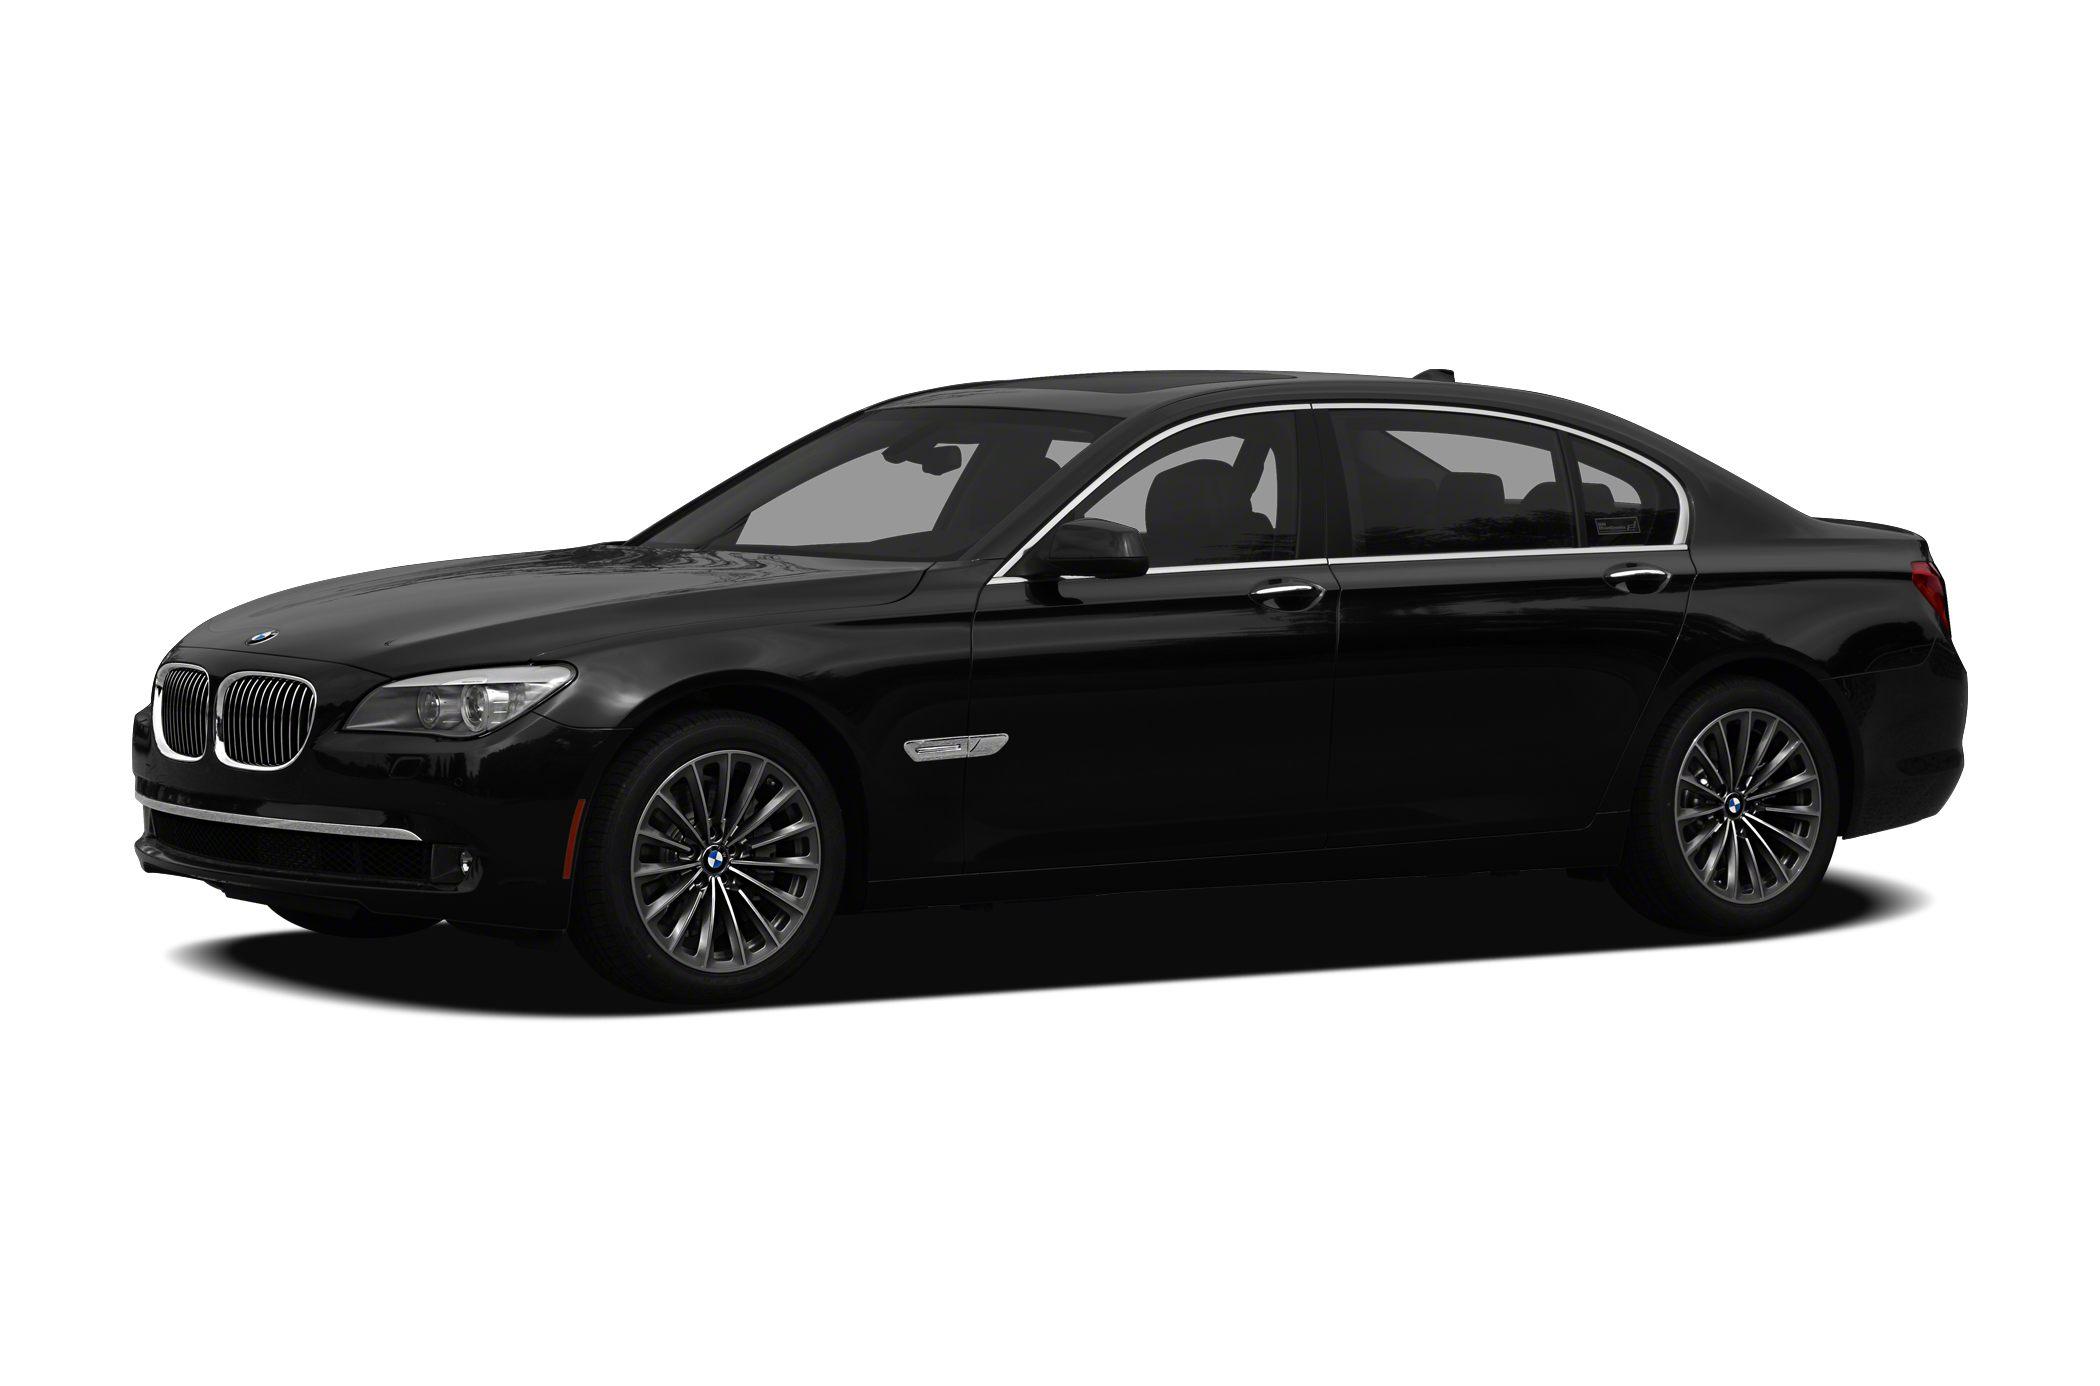 BMW Information - Arroway chevrolet car show